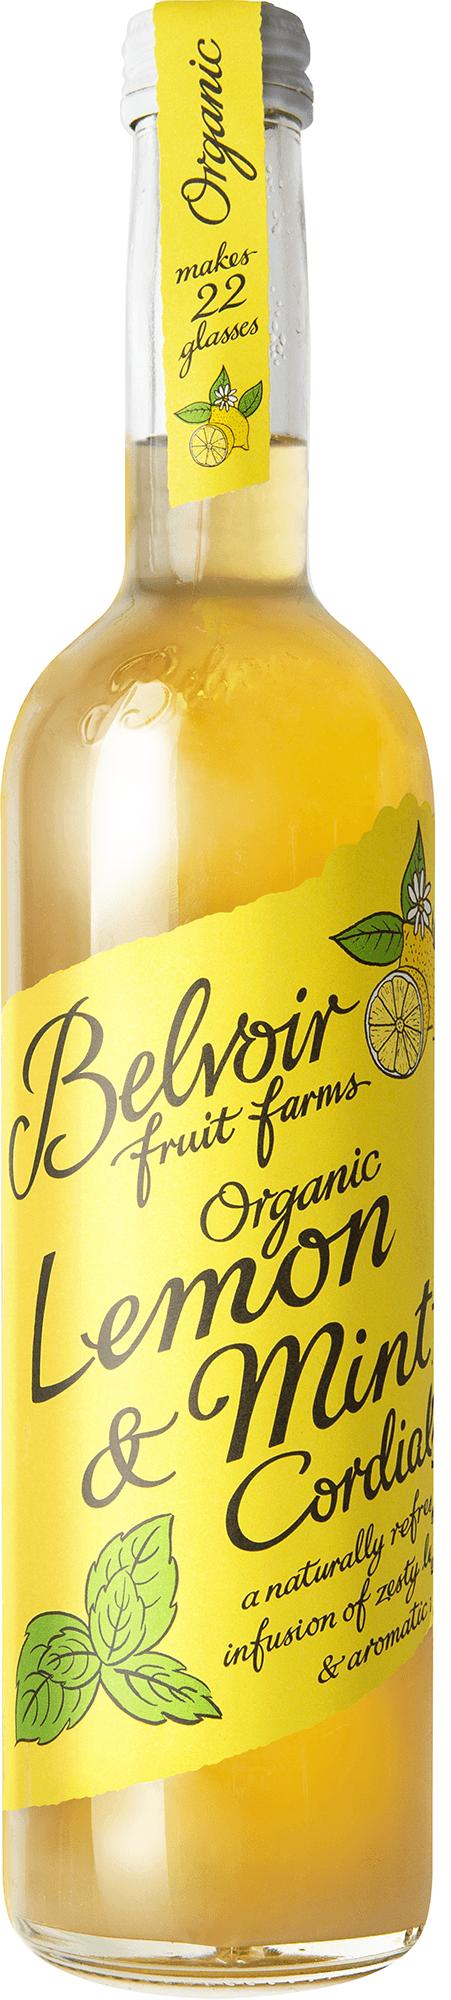 Belvoir Organic Lemon & Mint